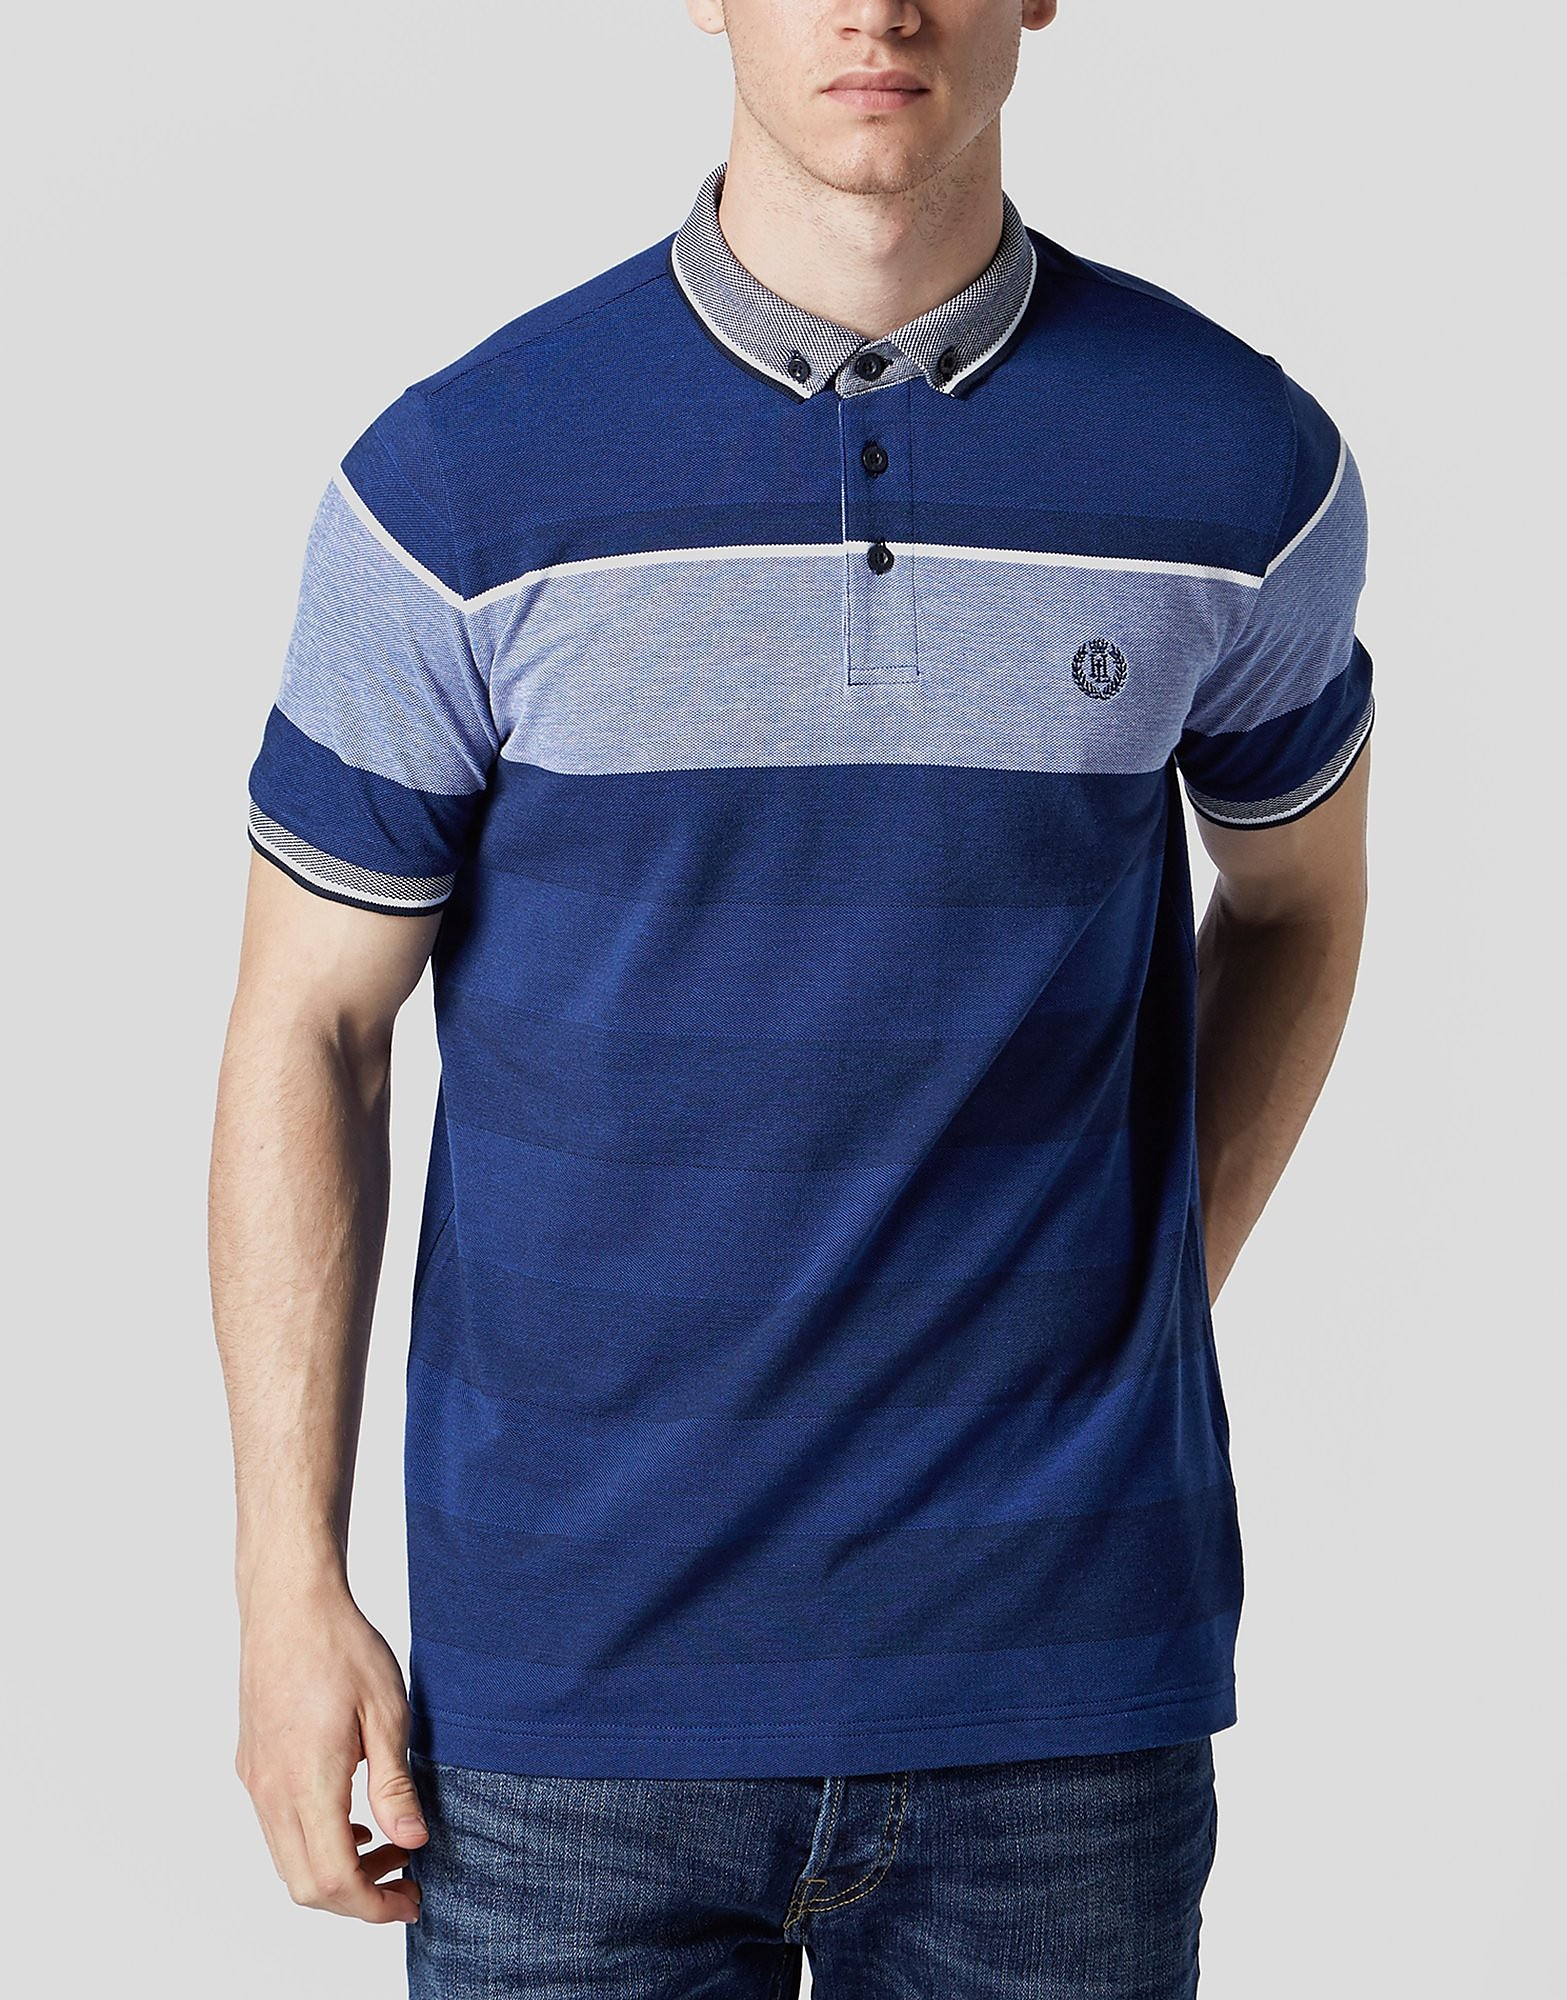 Henri Lloyd Bilting Stripe Polo Shirt